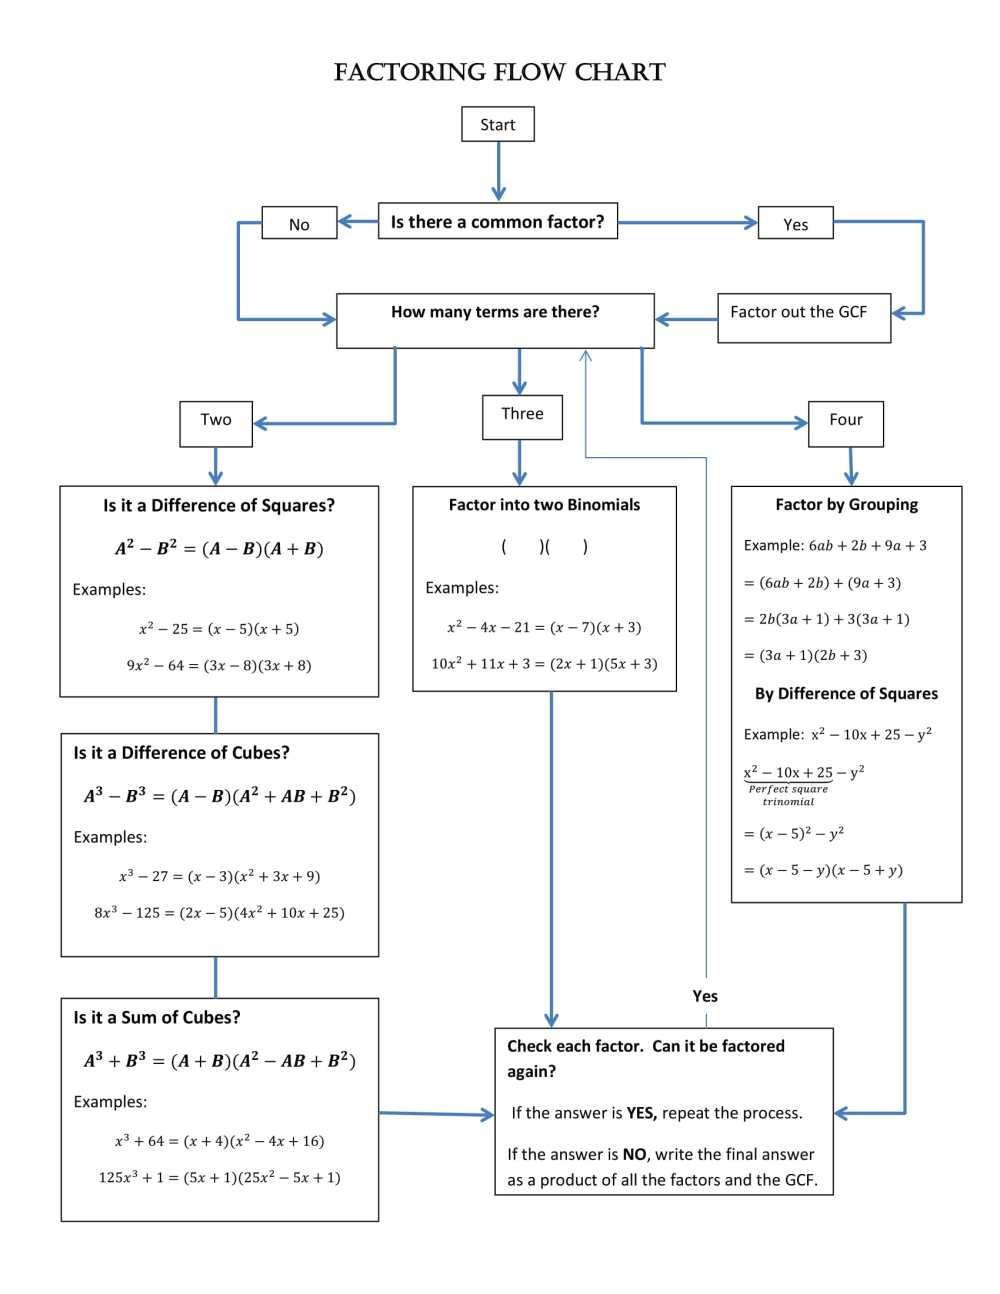 medium resolution of factoring flow chart example